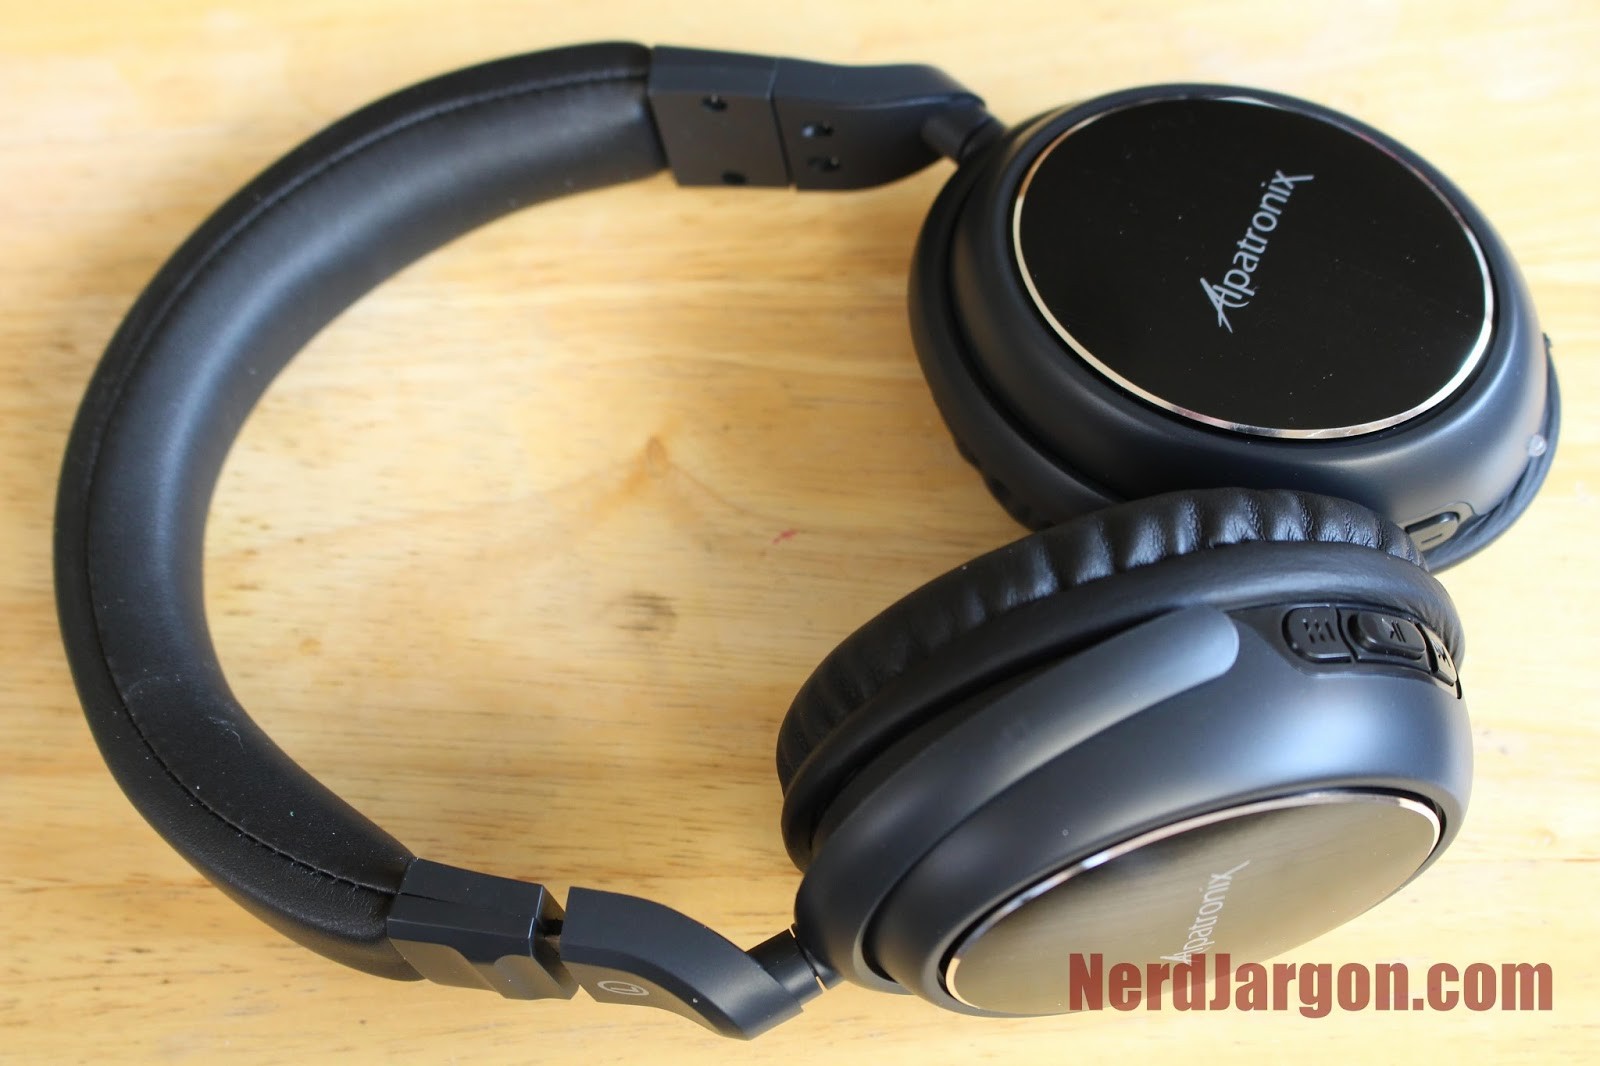 Alpatronix HX100 Stereo Bluetooth 2.0 Headphones: Product Link